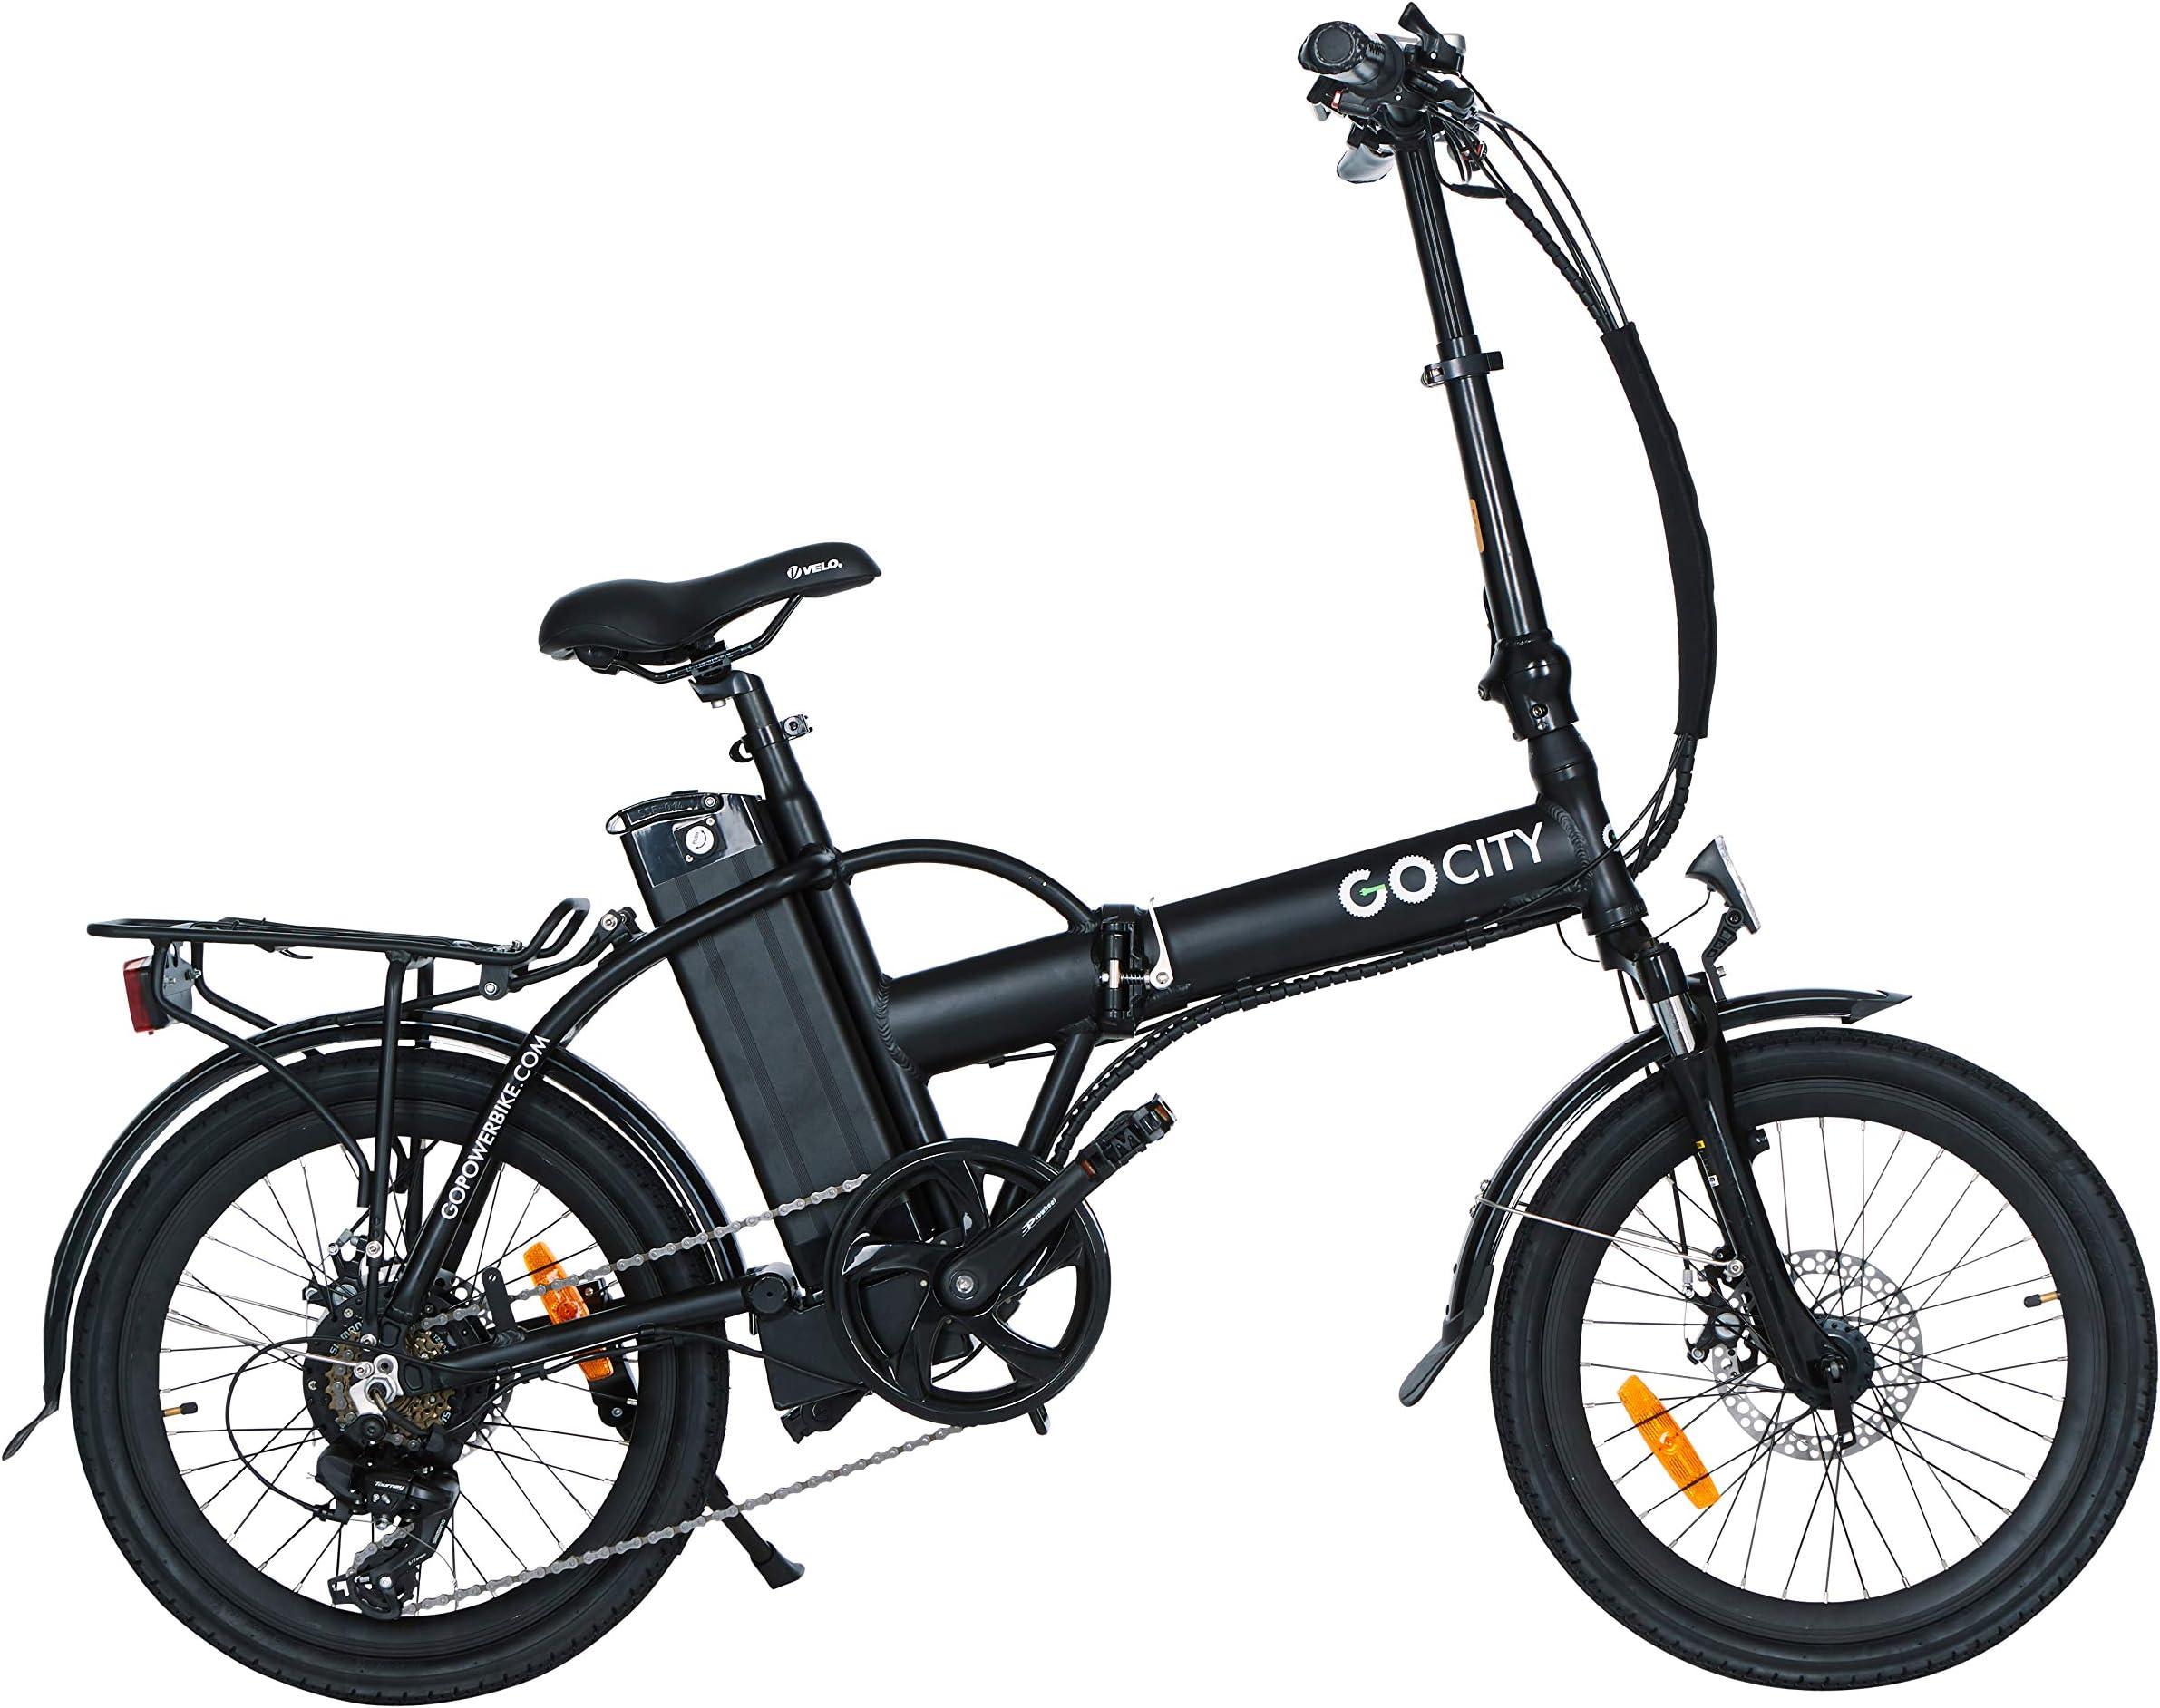 Details about  /20 500W Electric Bike Folding Fat-Tire Beach,Mountain Bicycle 12Ah B t s a e 161